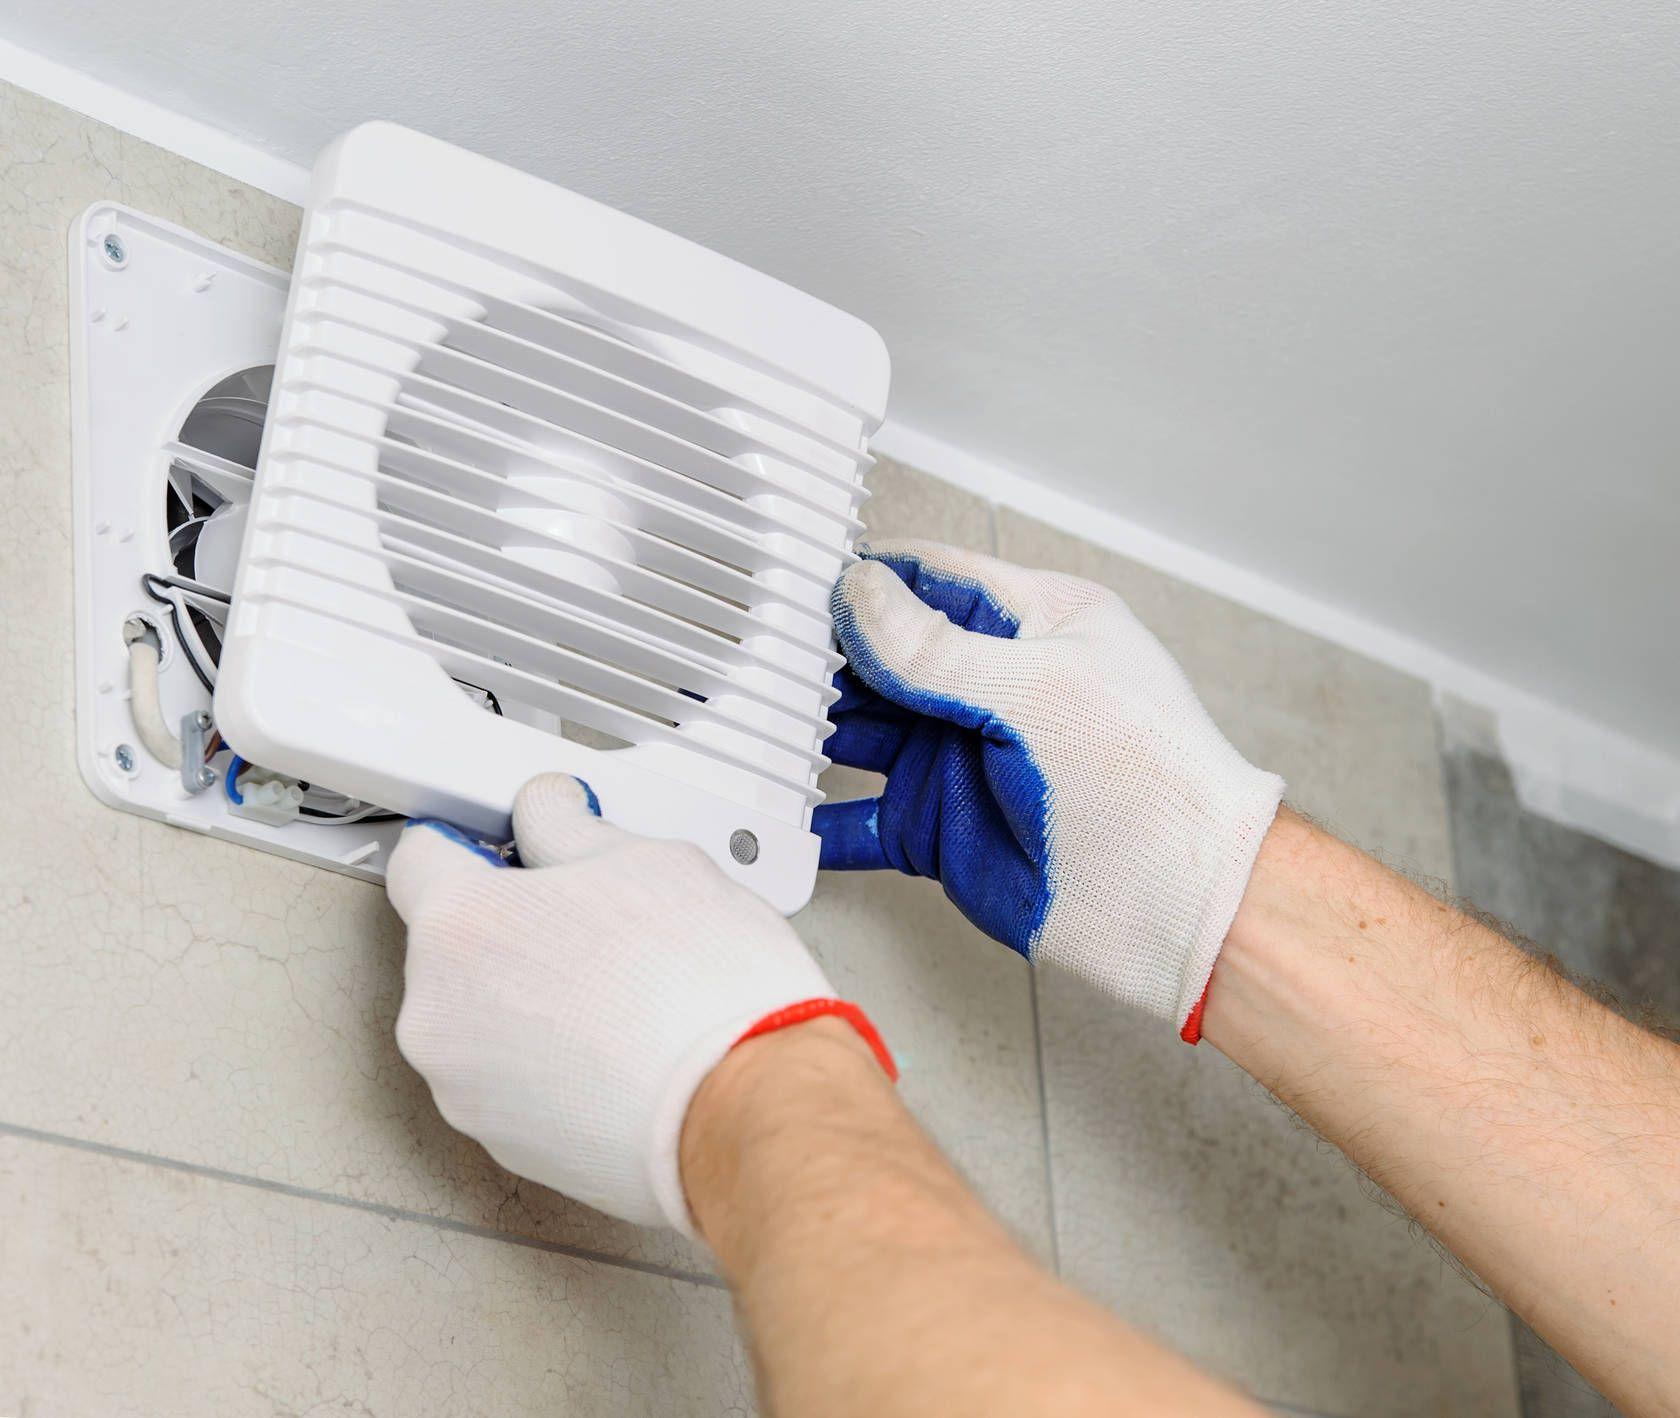 монтаж вентилятора в санузле